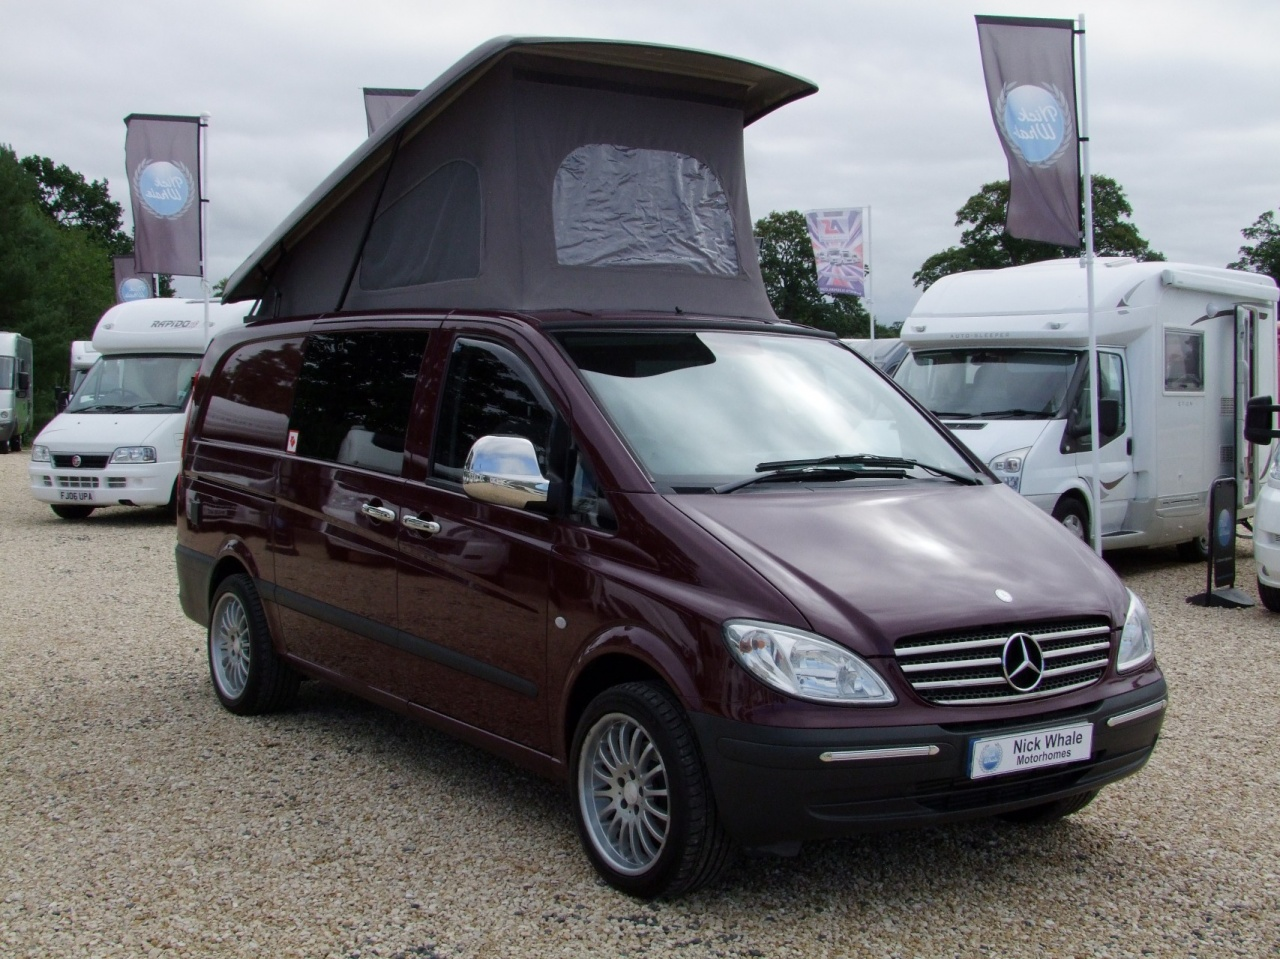 Mercedes Van Camper >> Camper Conversion Based Upon Mercedes Vito 111 CDi | Nick Whale Sports Cars